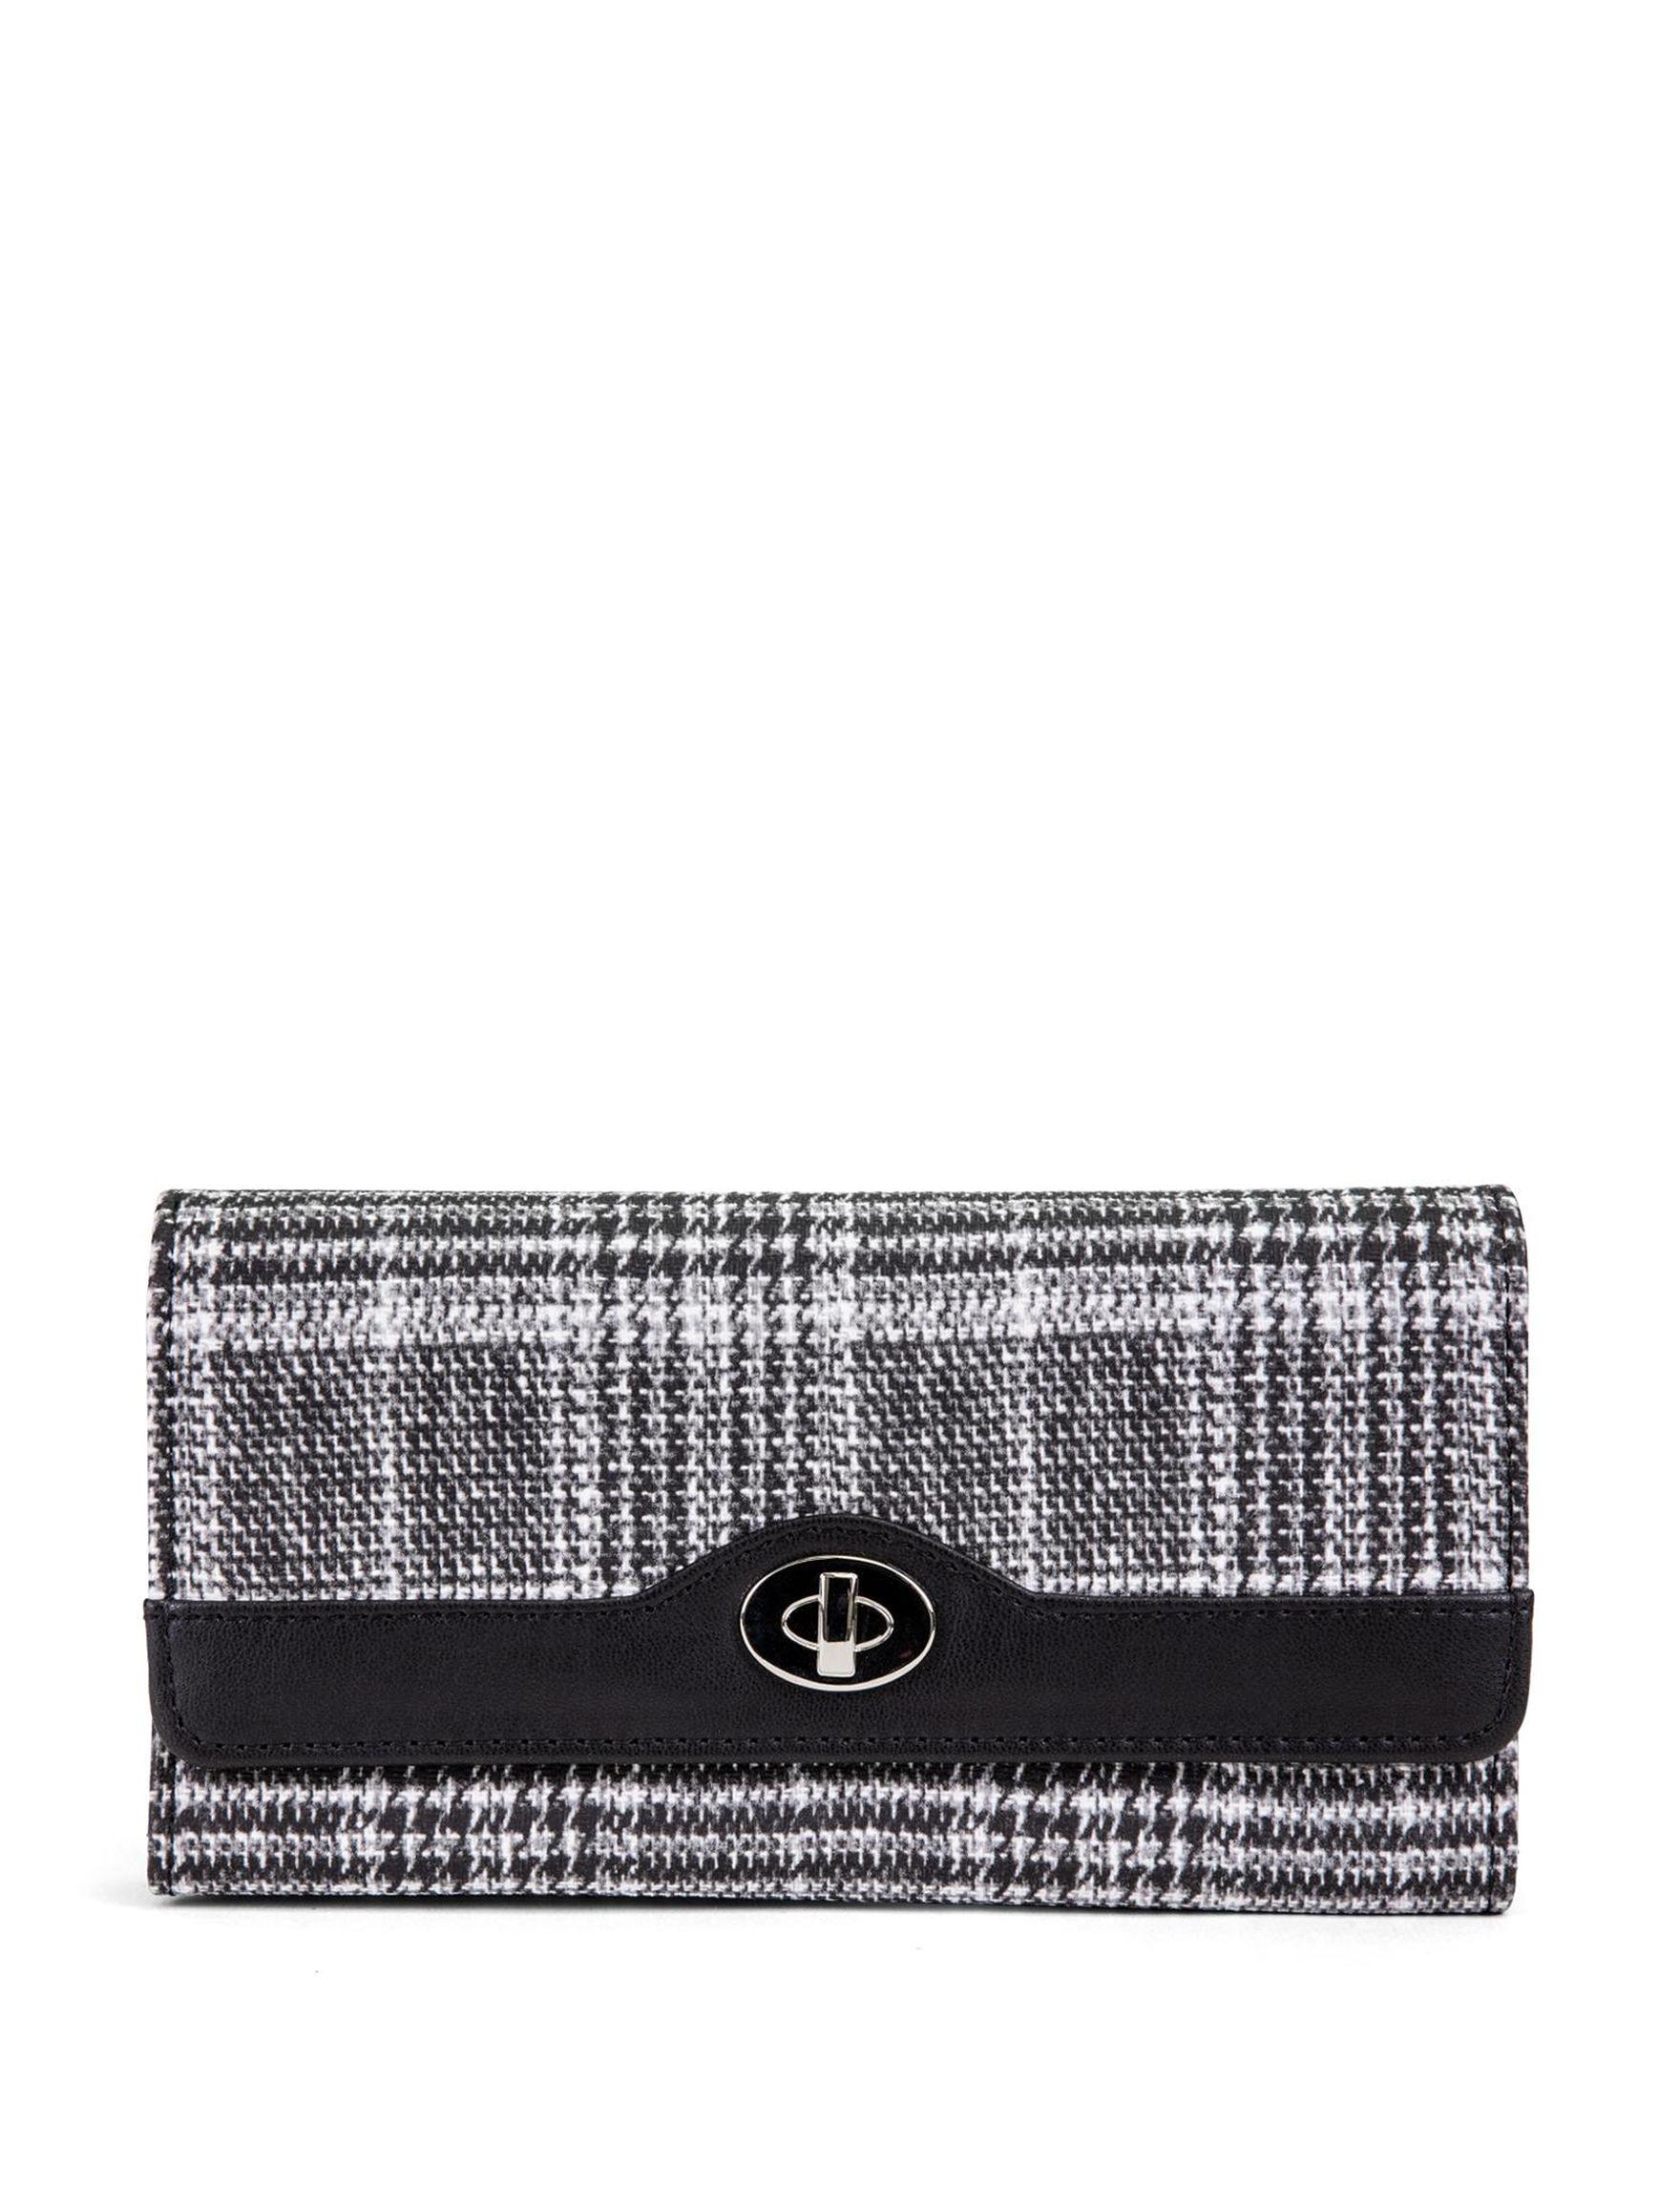 Mundi Black / White Wallet